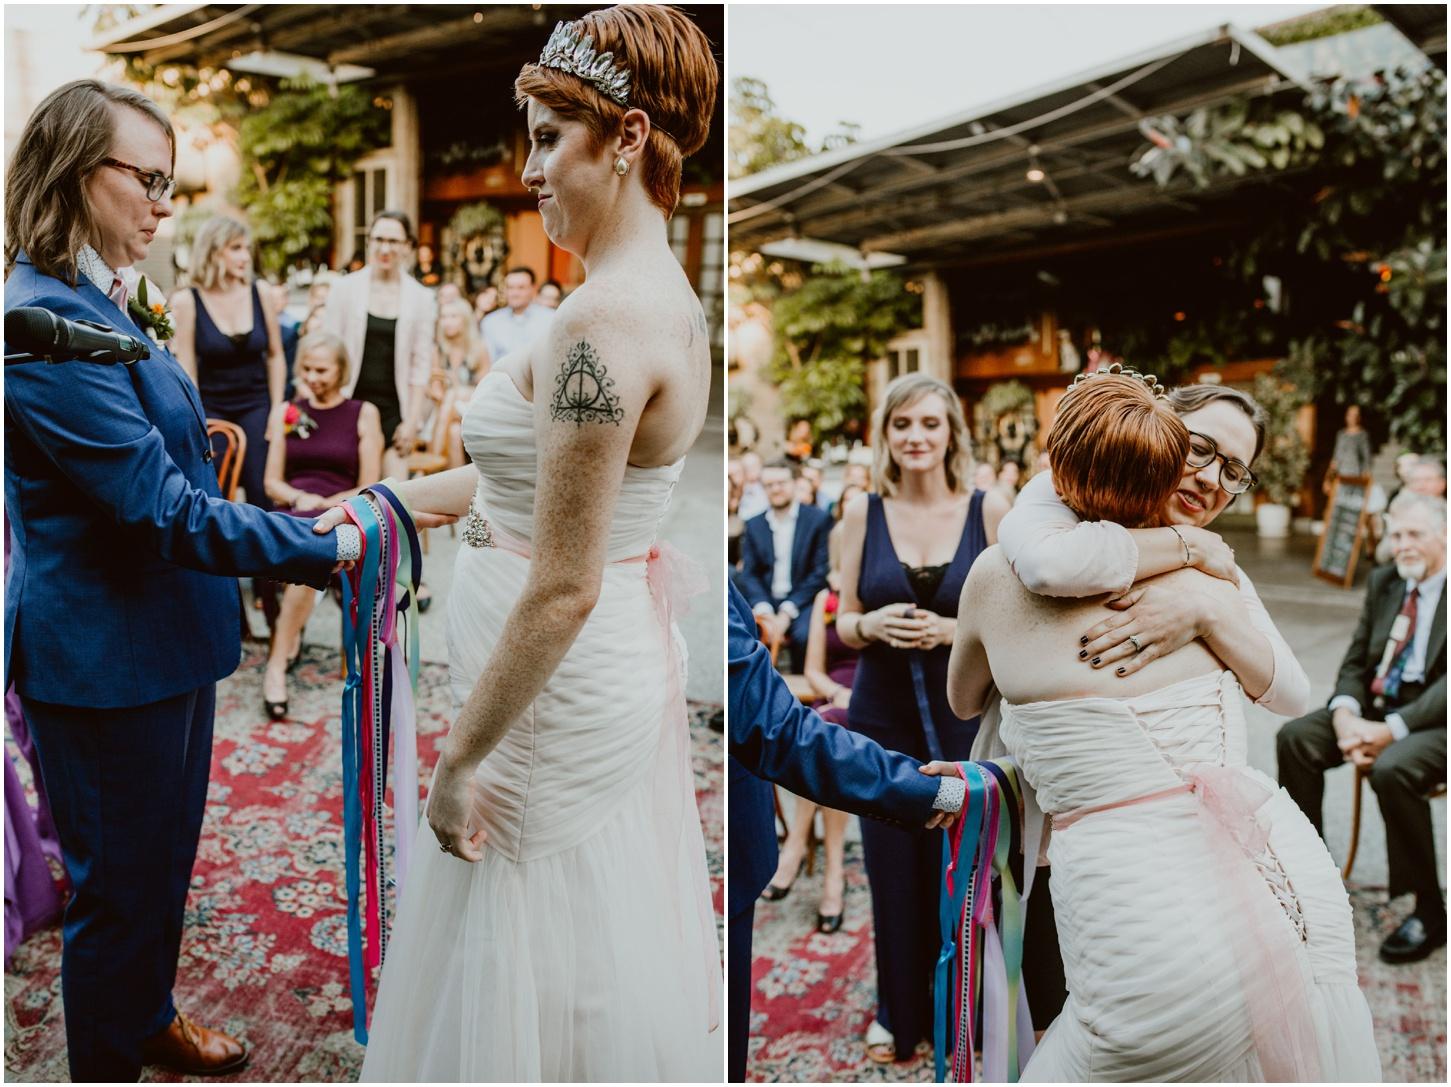 Smogshoppe-Wedding-S+C-Diana-Lake-Photography-493.jpg